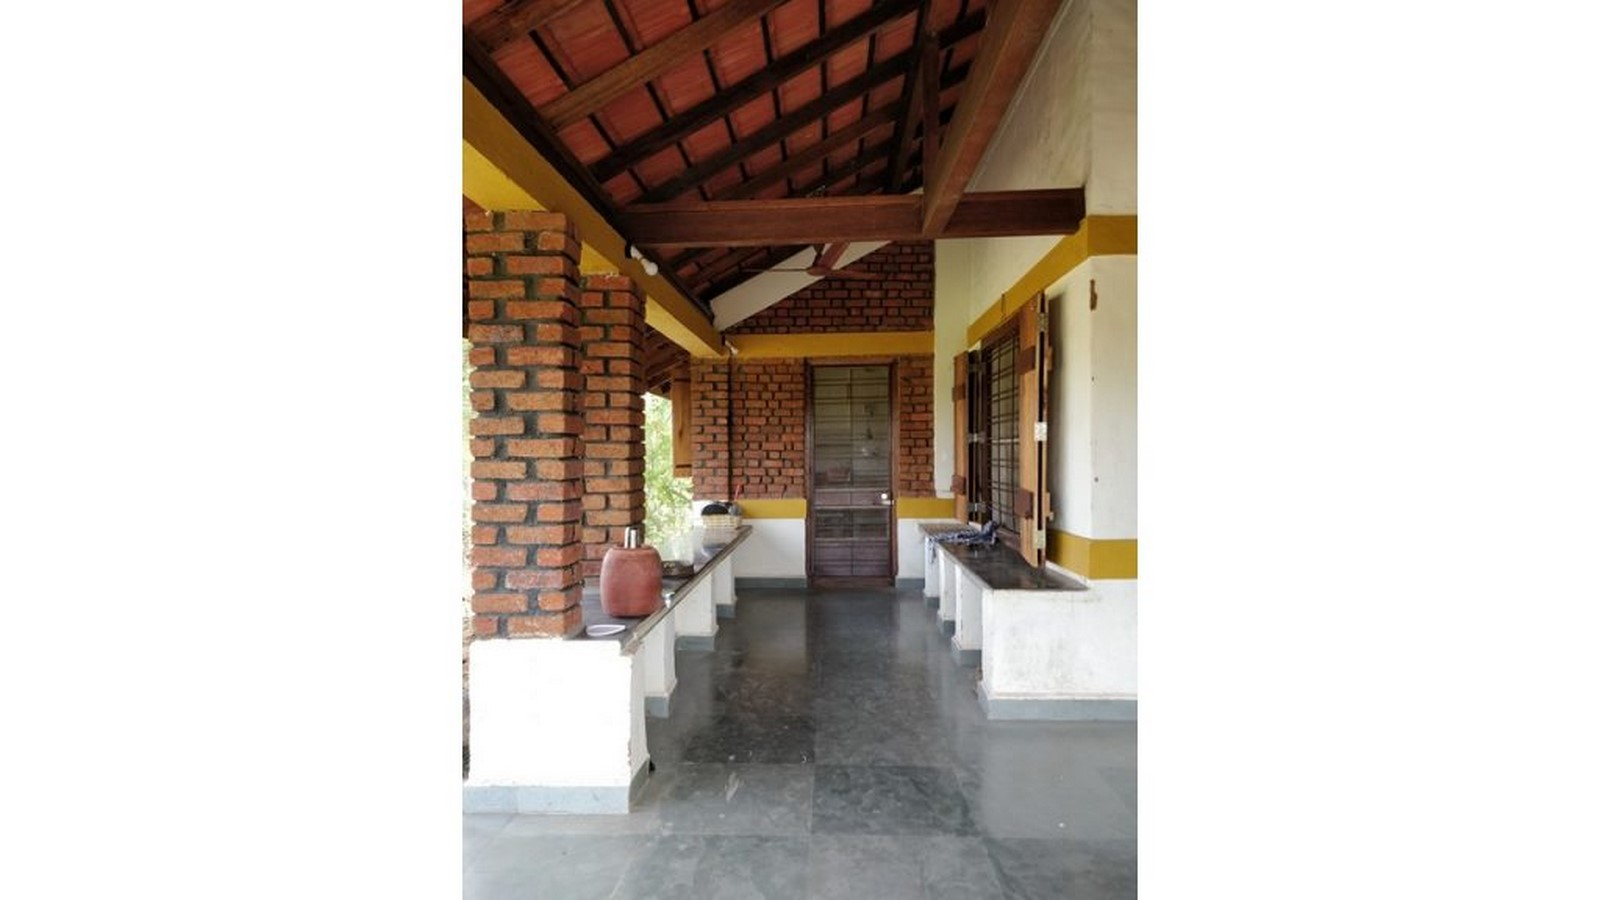 Design Jatra: Pioneering Sustainable Architecture of Regional India Sheet13